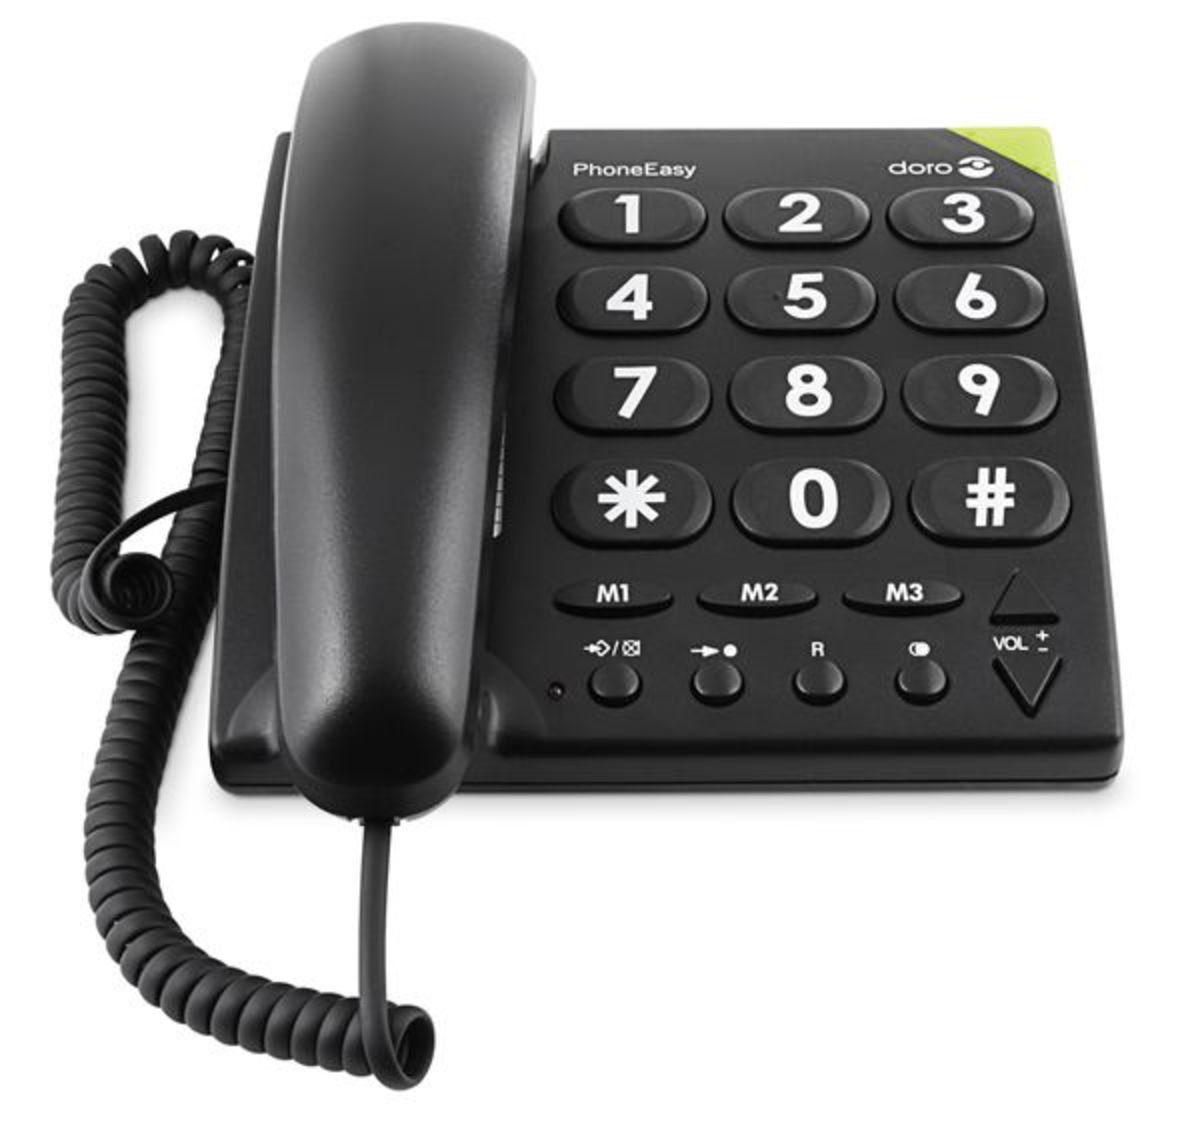 Doro Telefon analog schnurgebunden »PhoneEasy 311c, Schwarz«